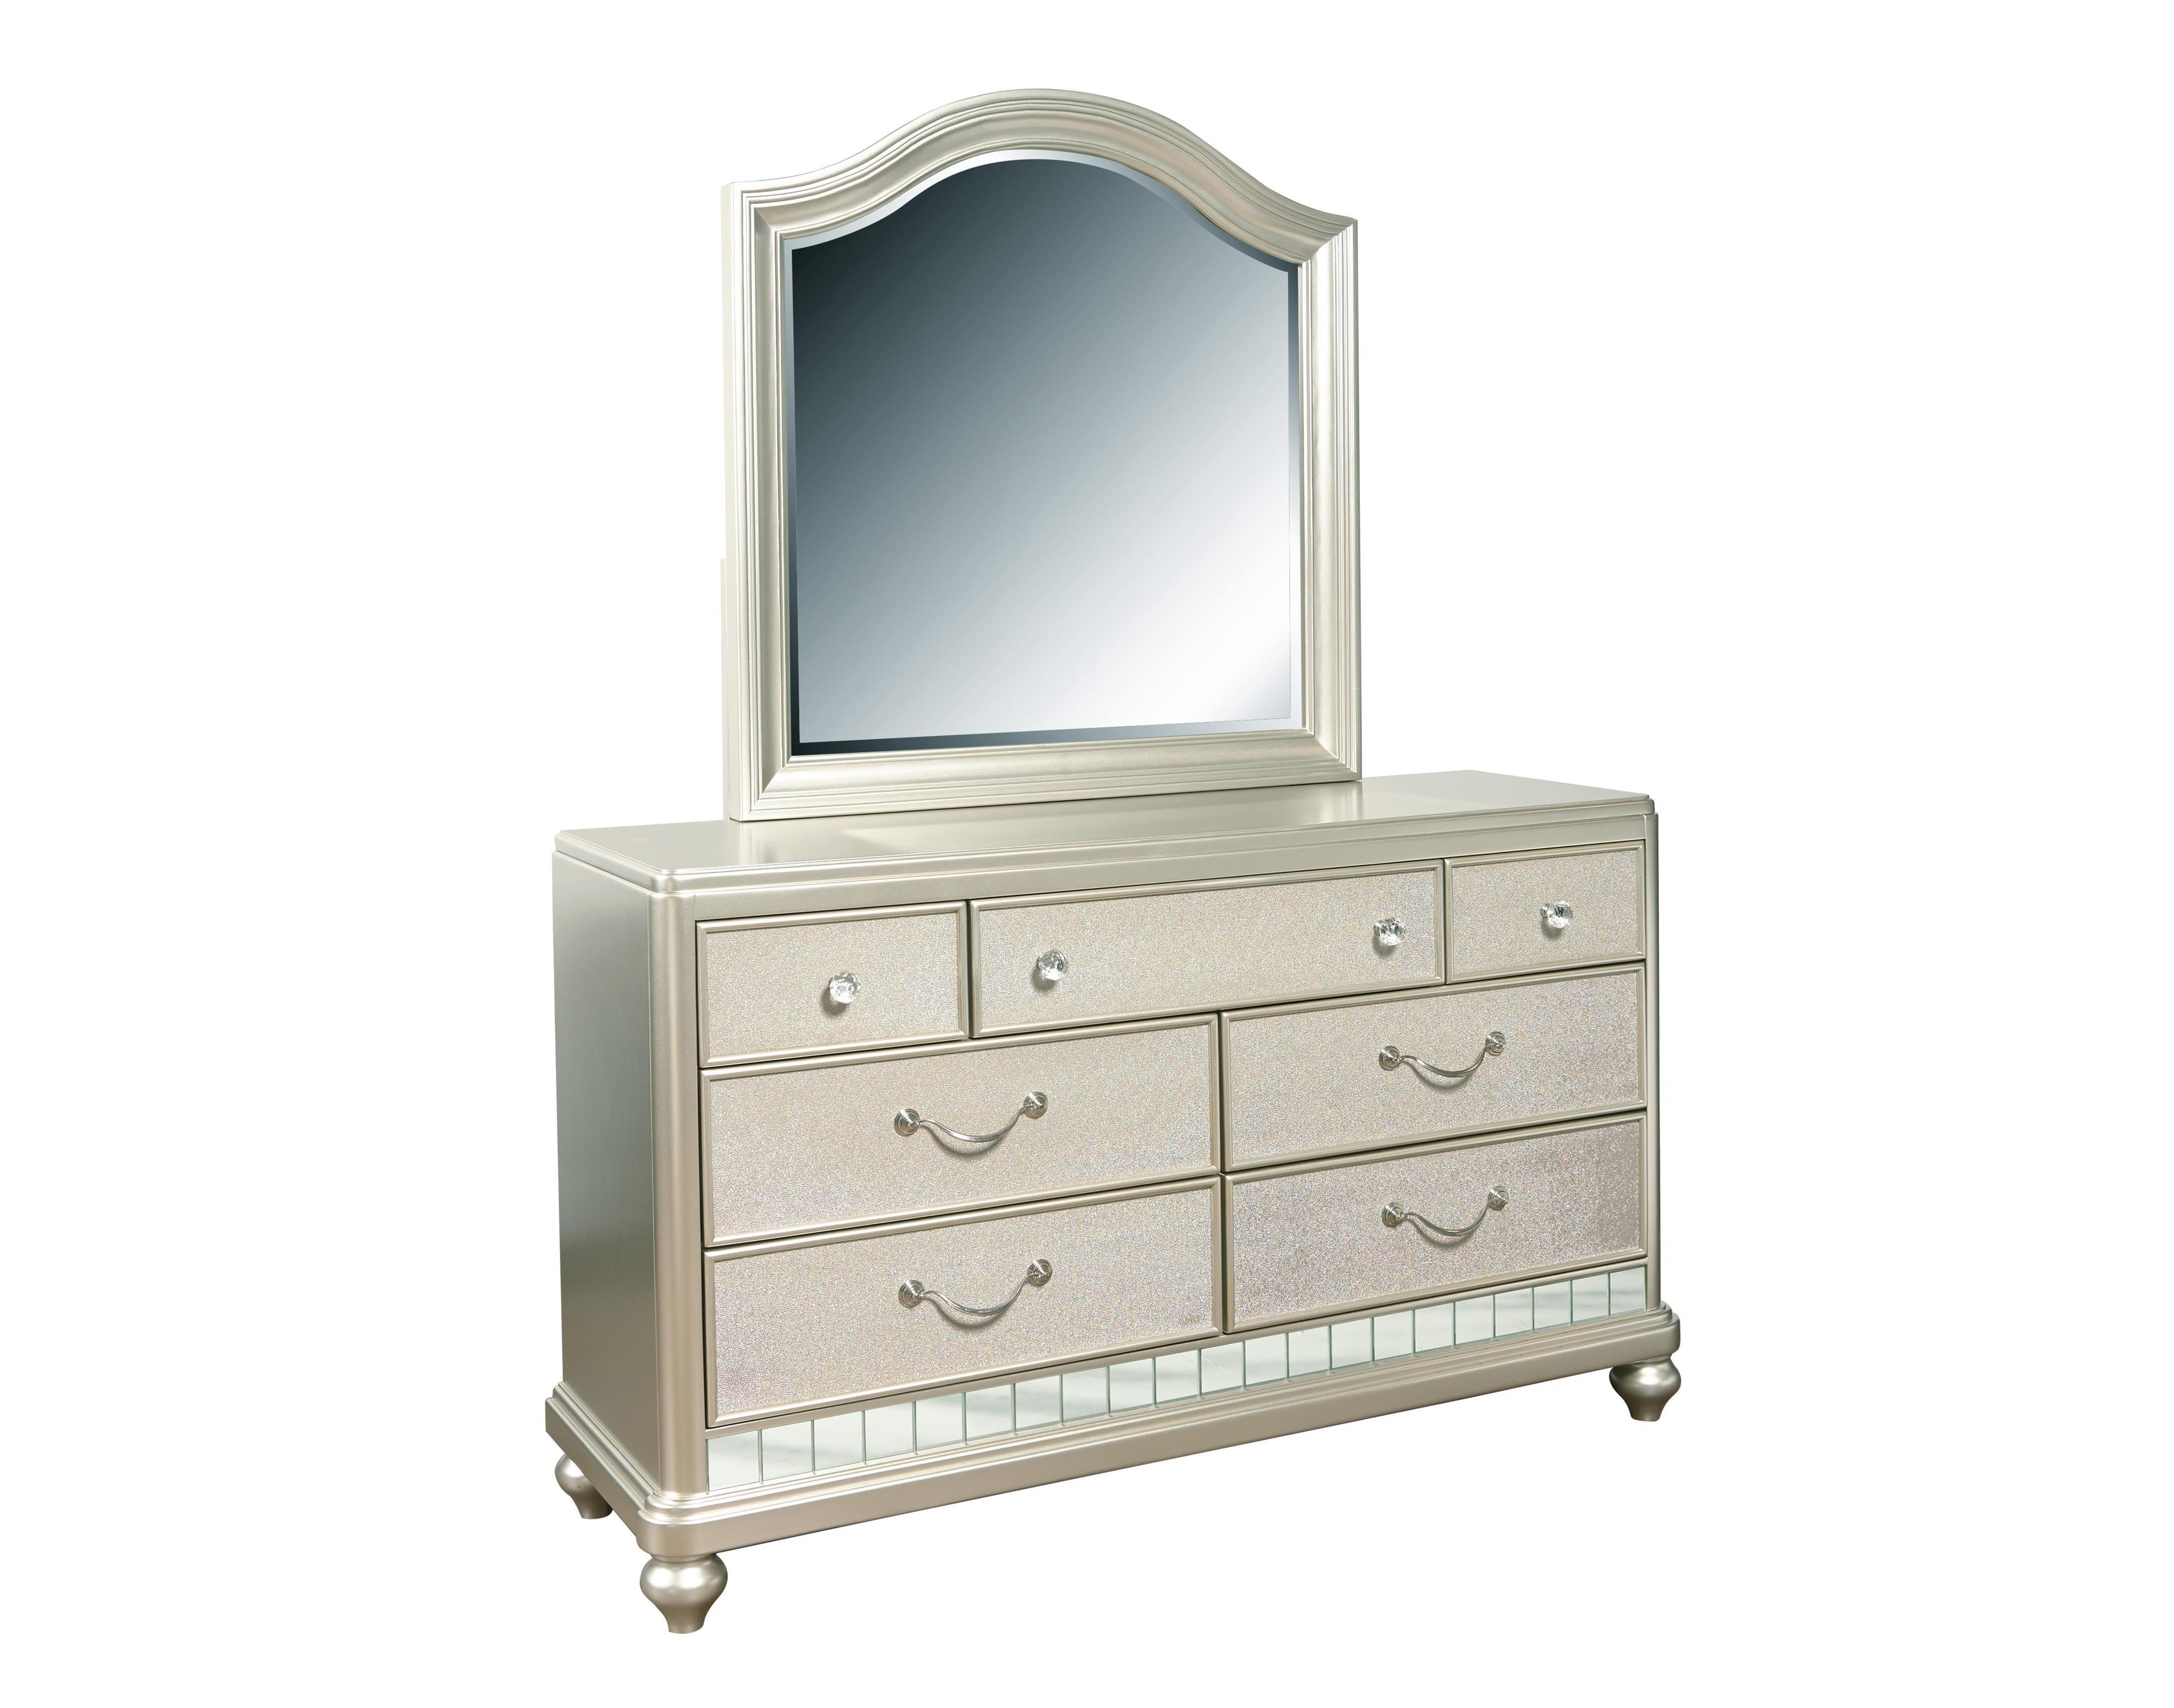 samuel lawrence lil diva landscape mirror miskelly